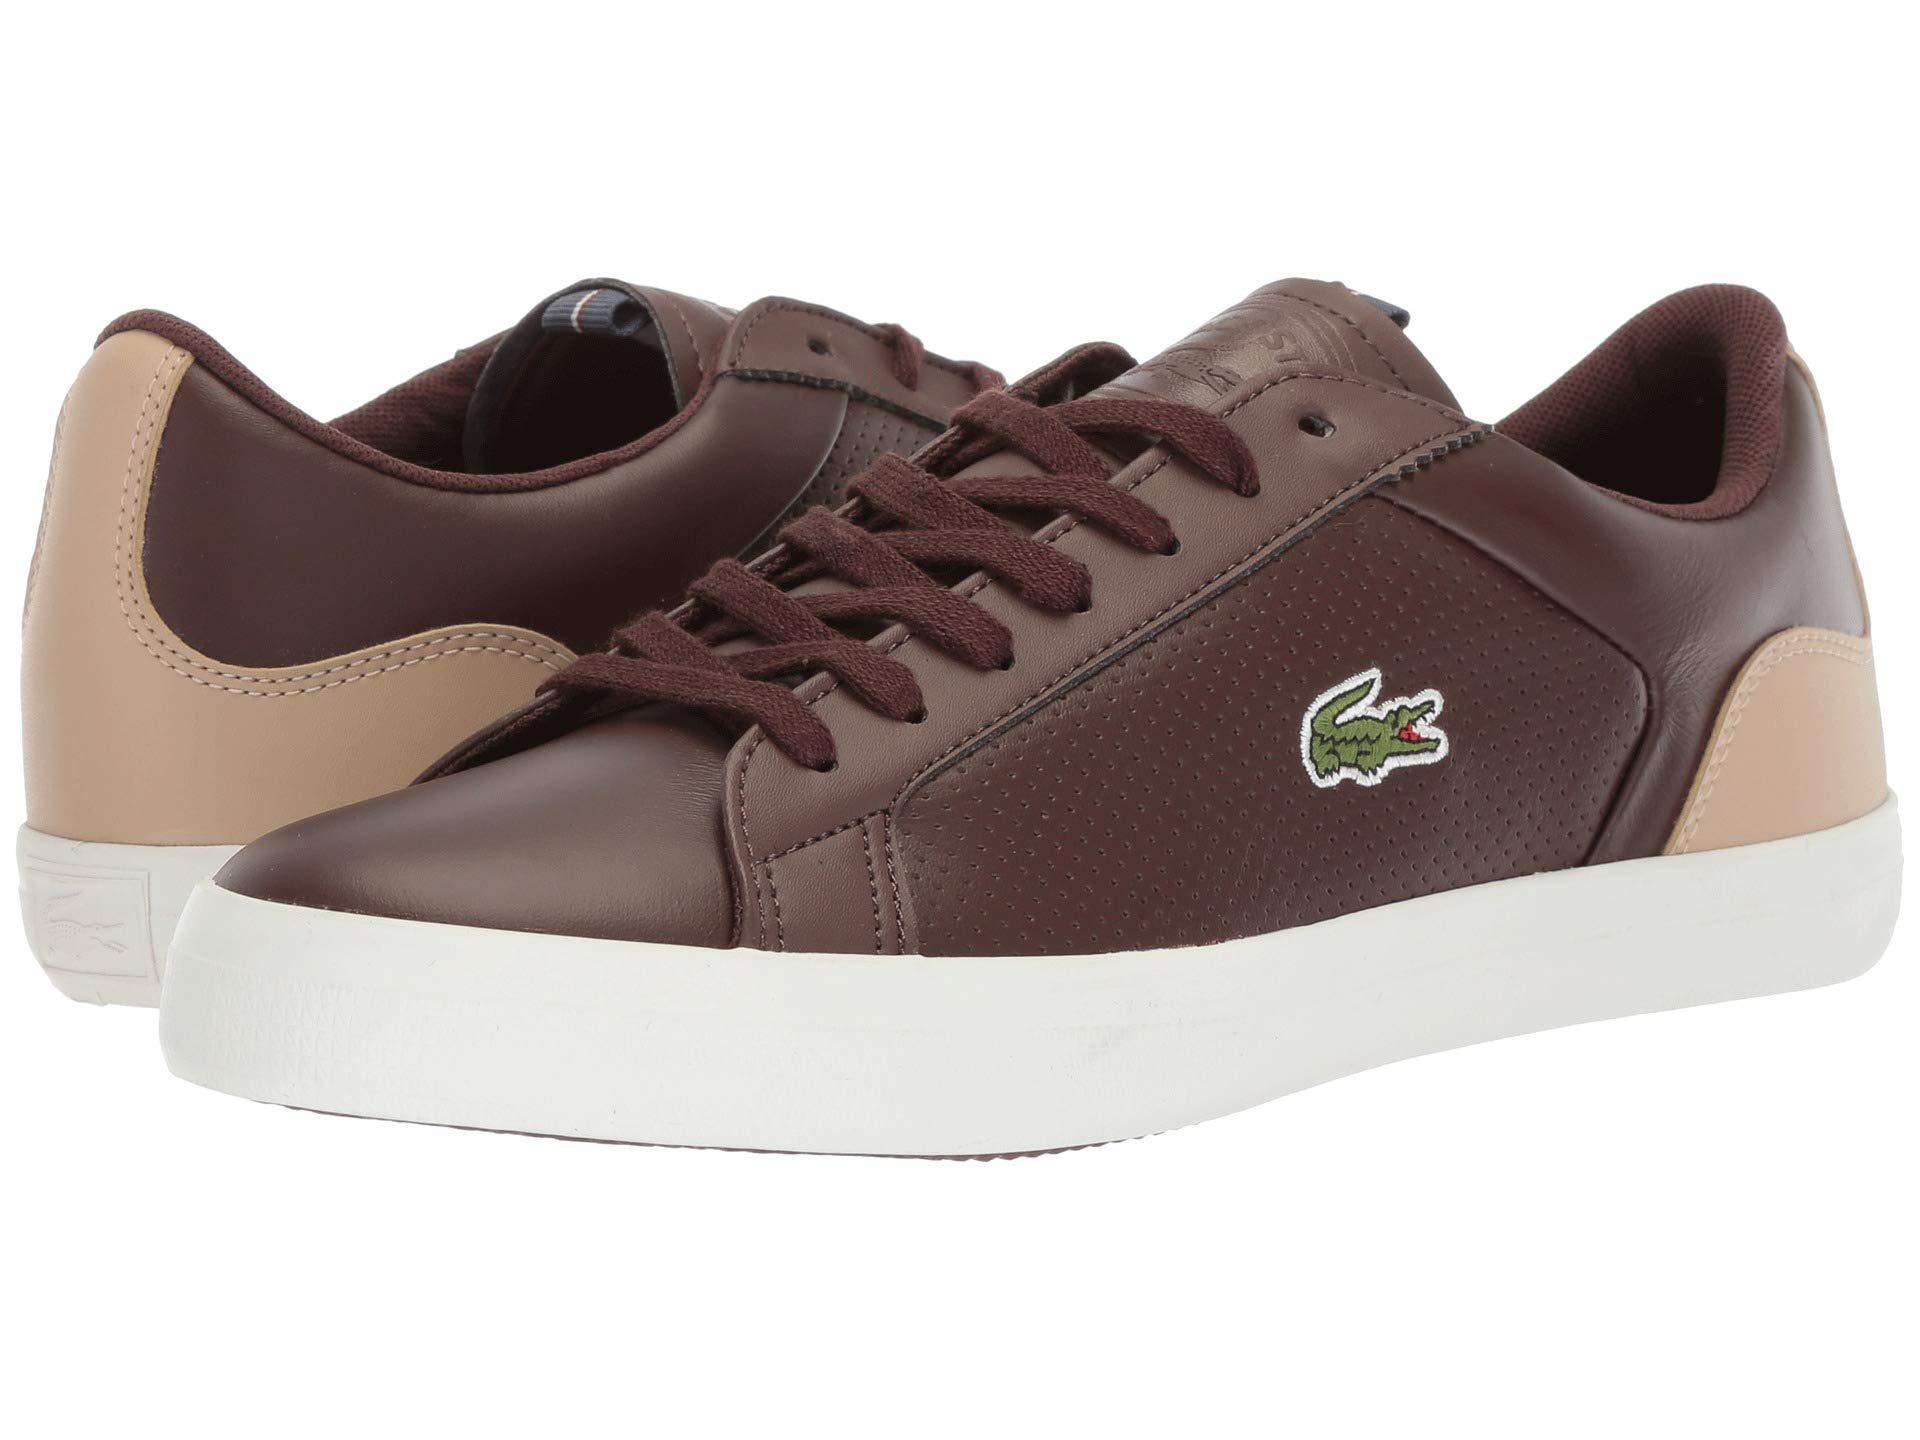 b1521ba88 Lacoste - Lerond 418 1 (brown natural) Men s Shoes for Men - Lyst. View  fullscreen